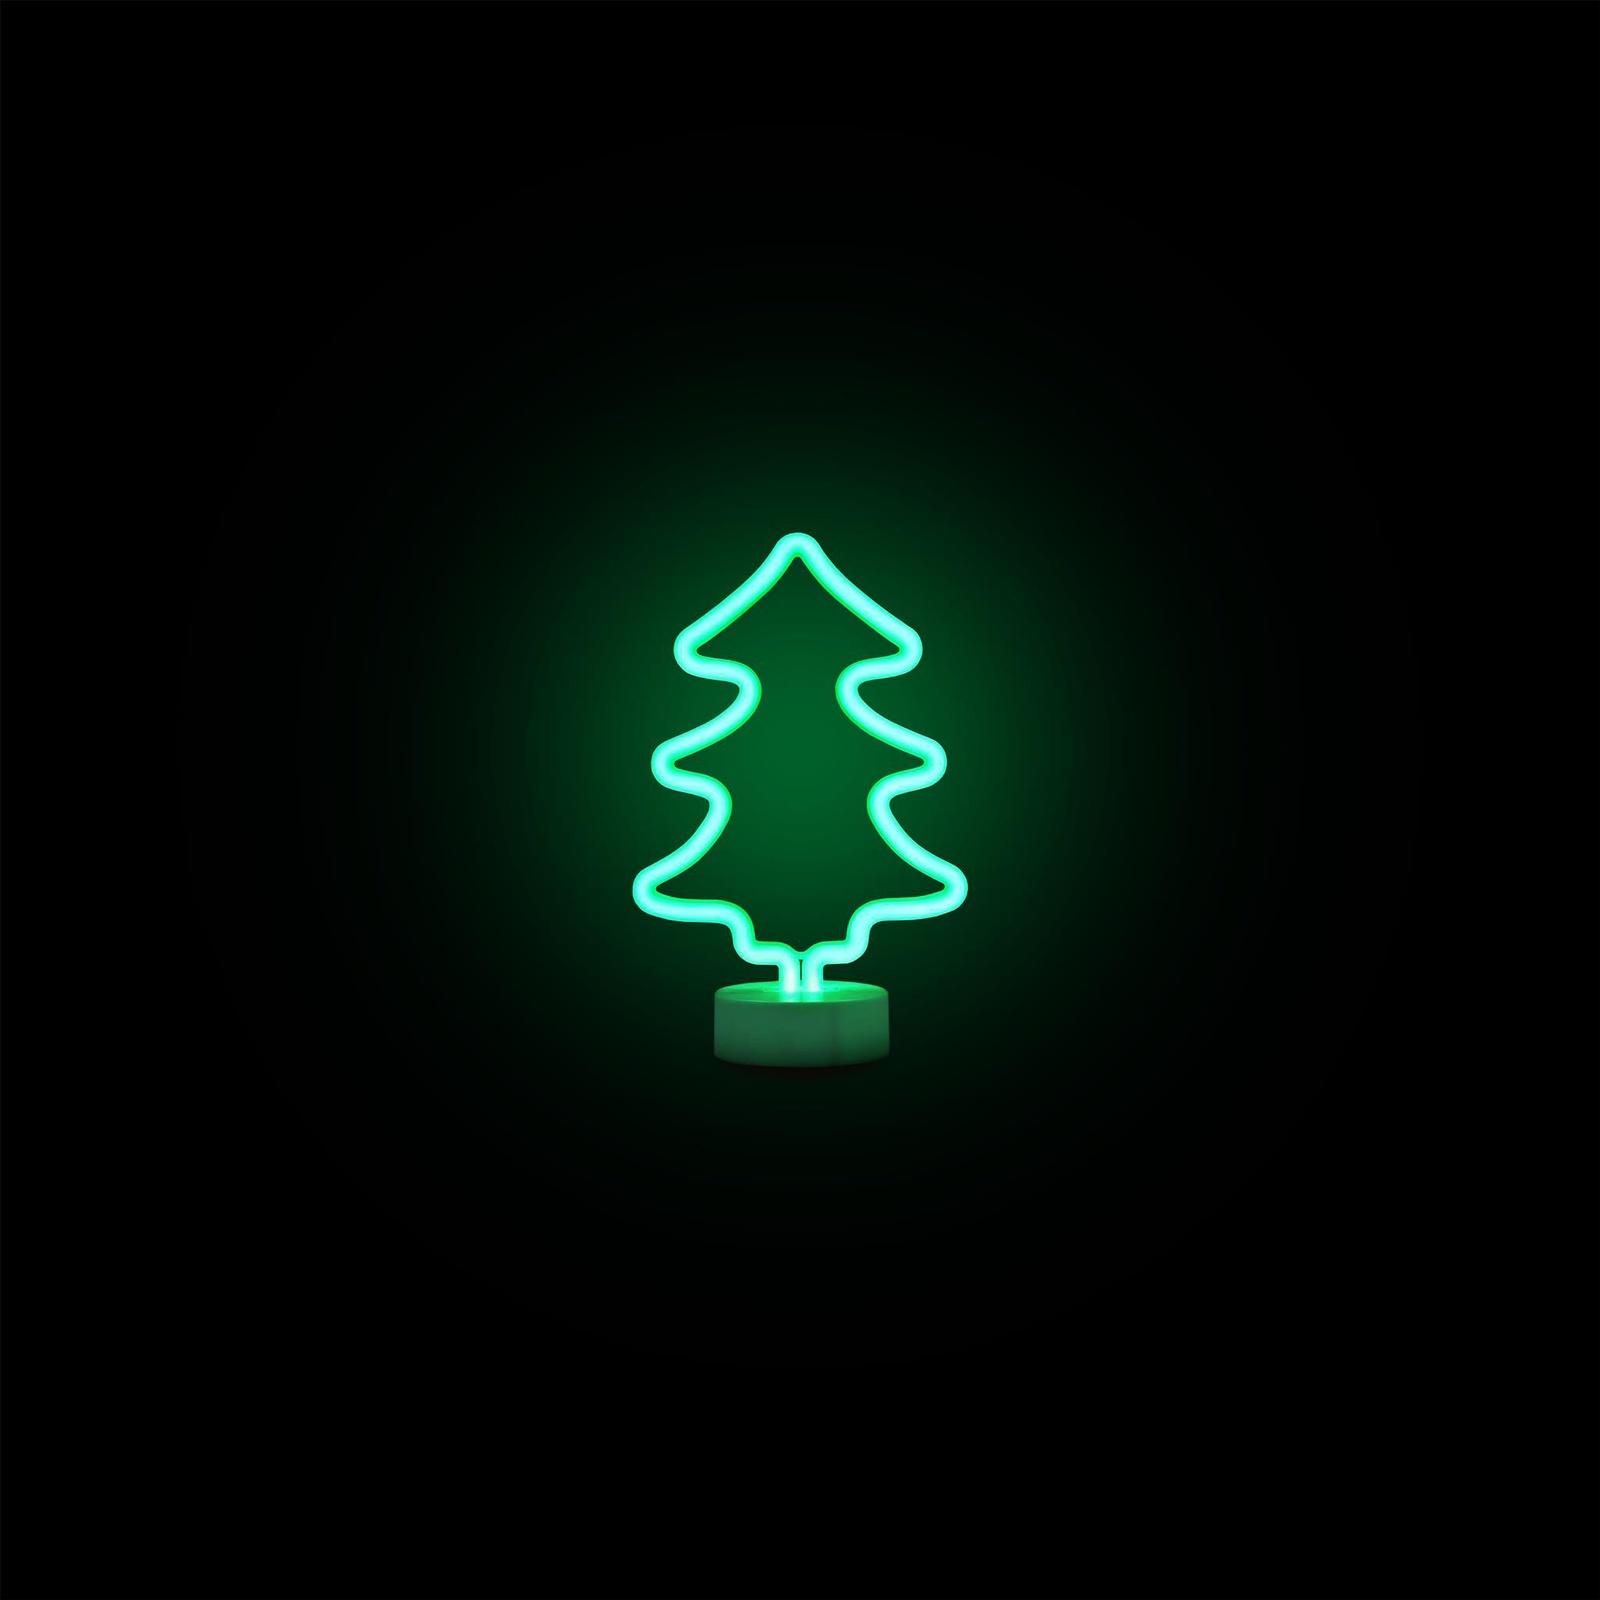 Декоративный светильник APEYRON electrics Елка светодиодный неоновый светильник apeyron electrics фламинго